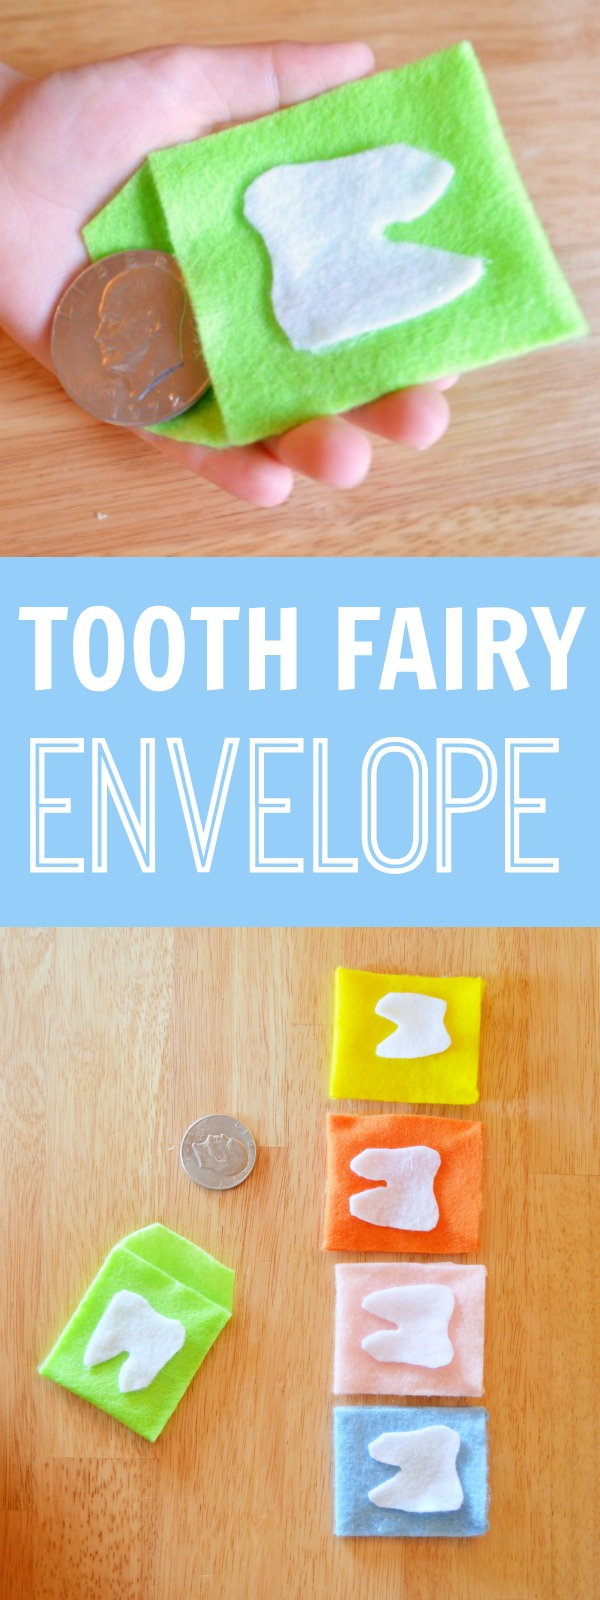 Tooth Fairy Envelope | Easy DIY